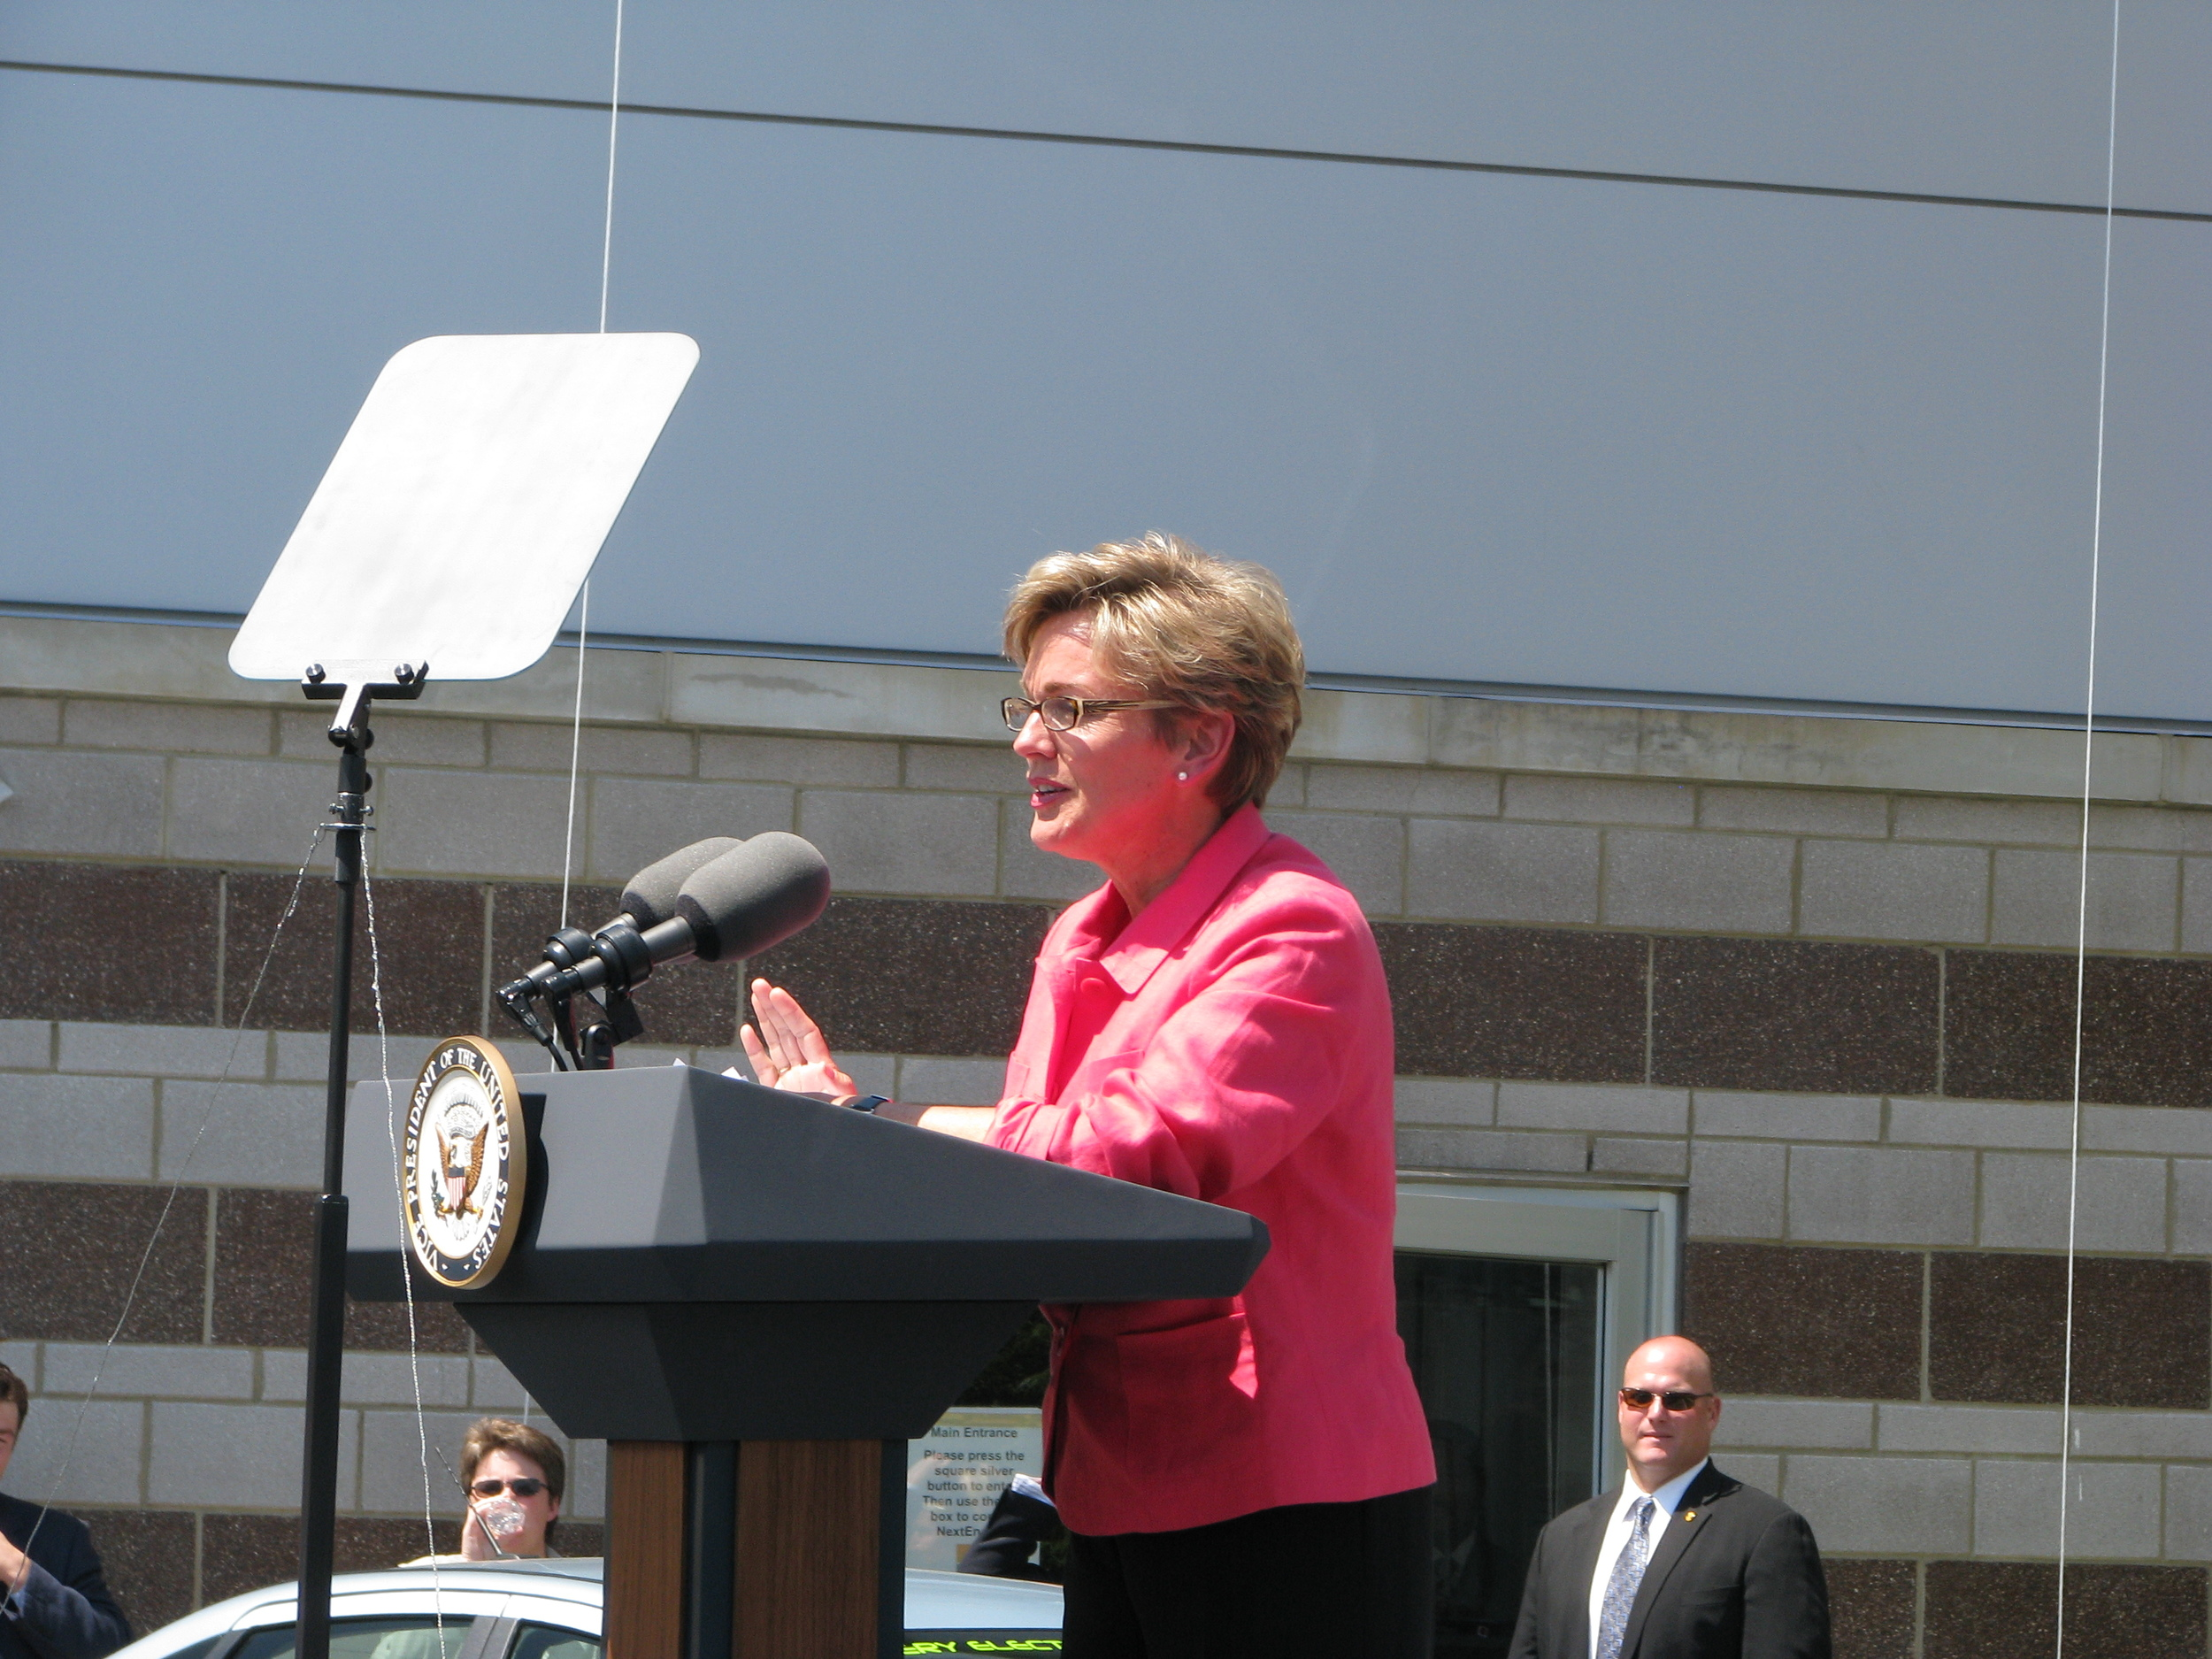 Governor Granholm, introducing Mr. Biden.